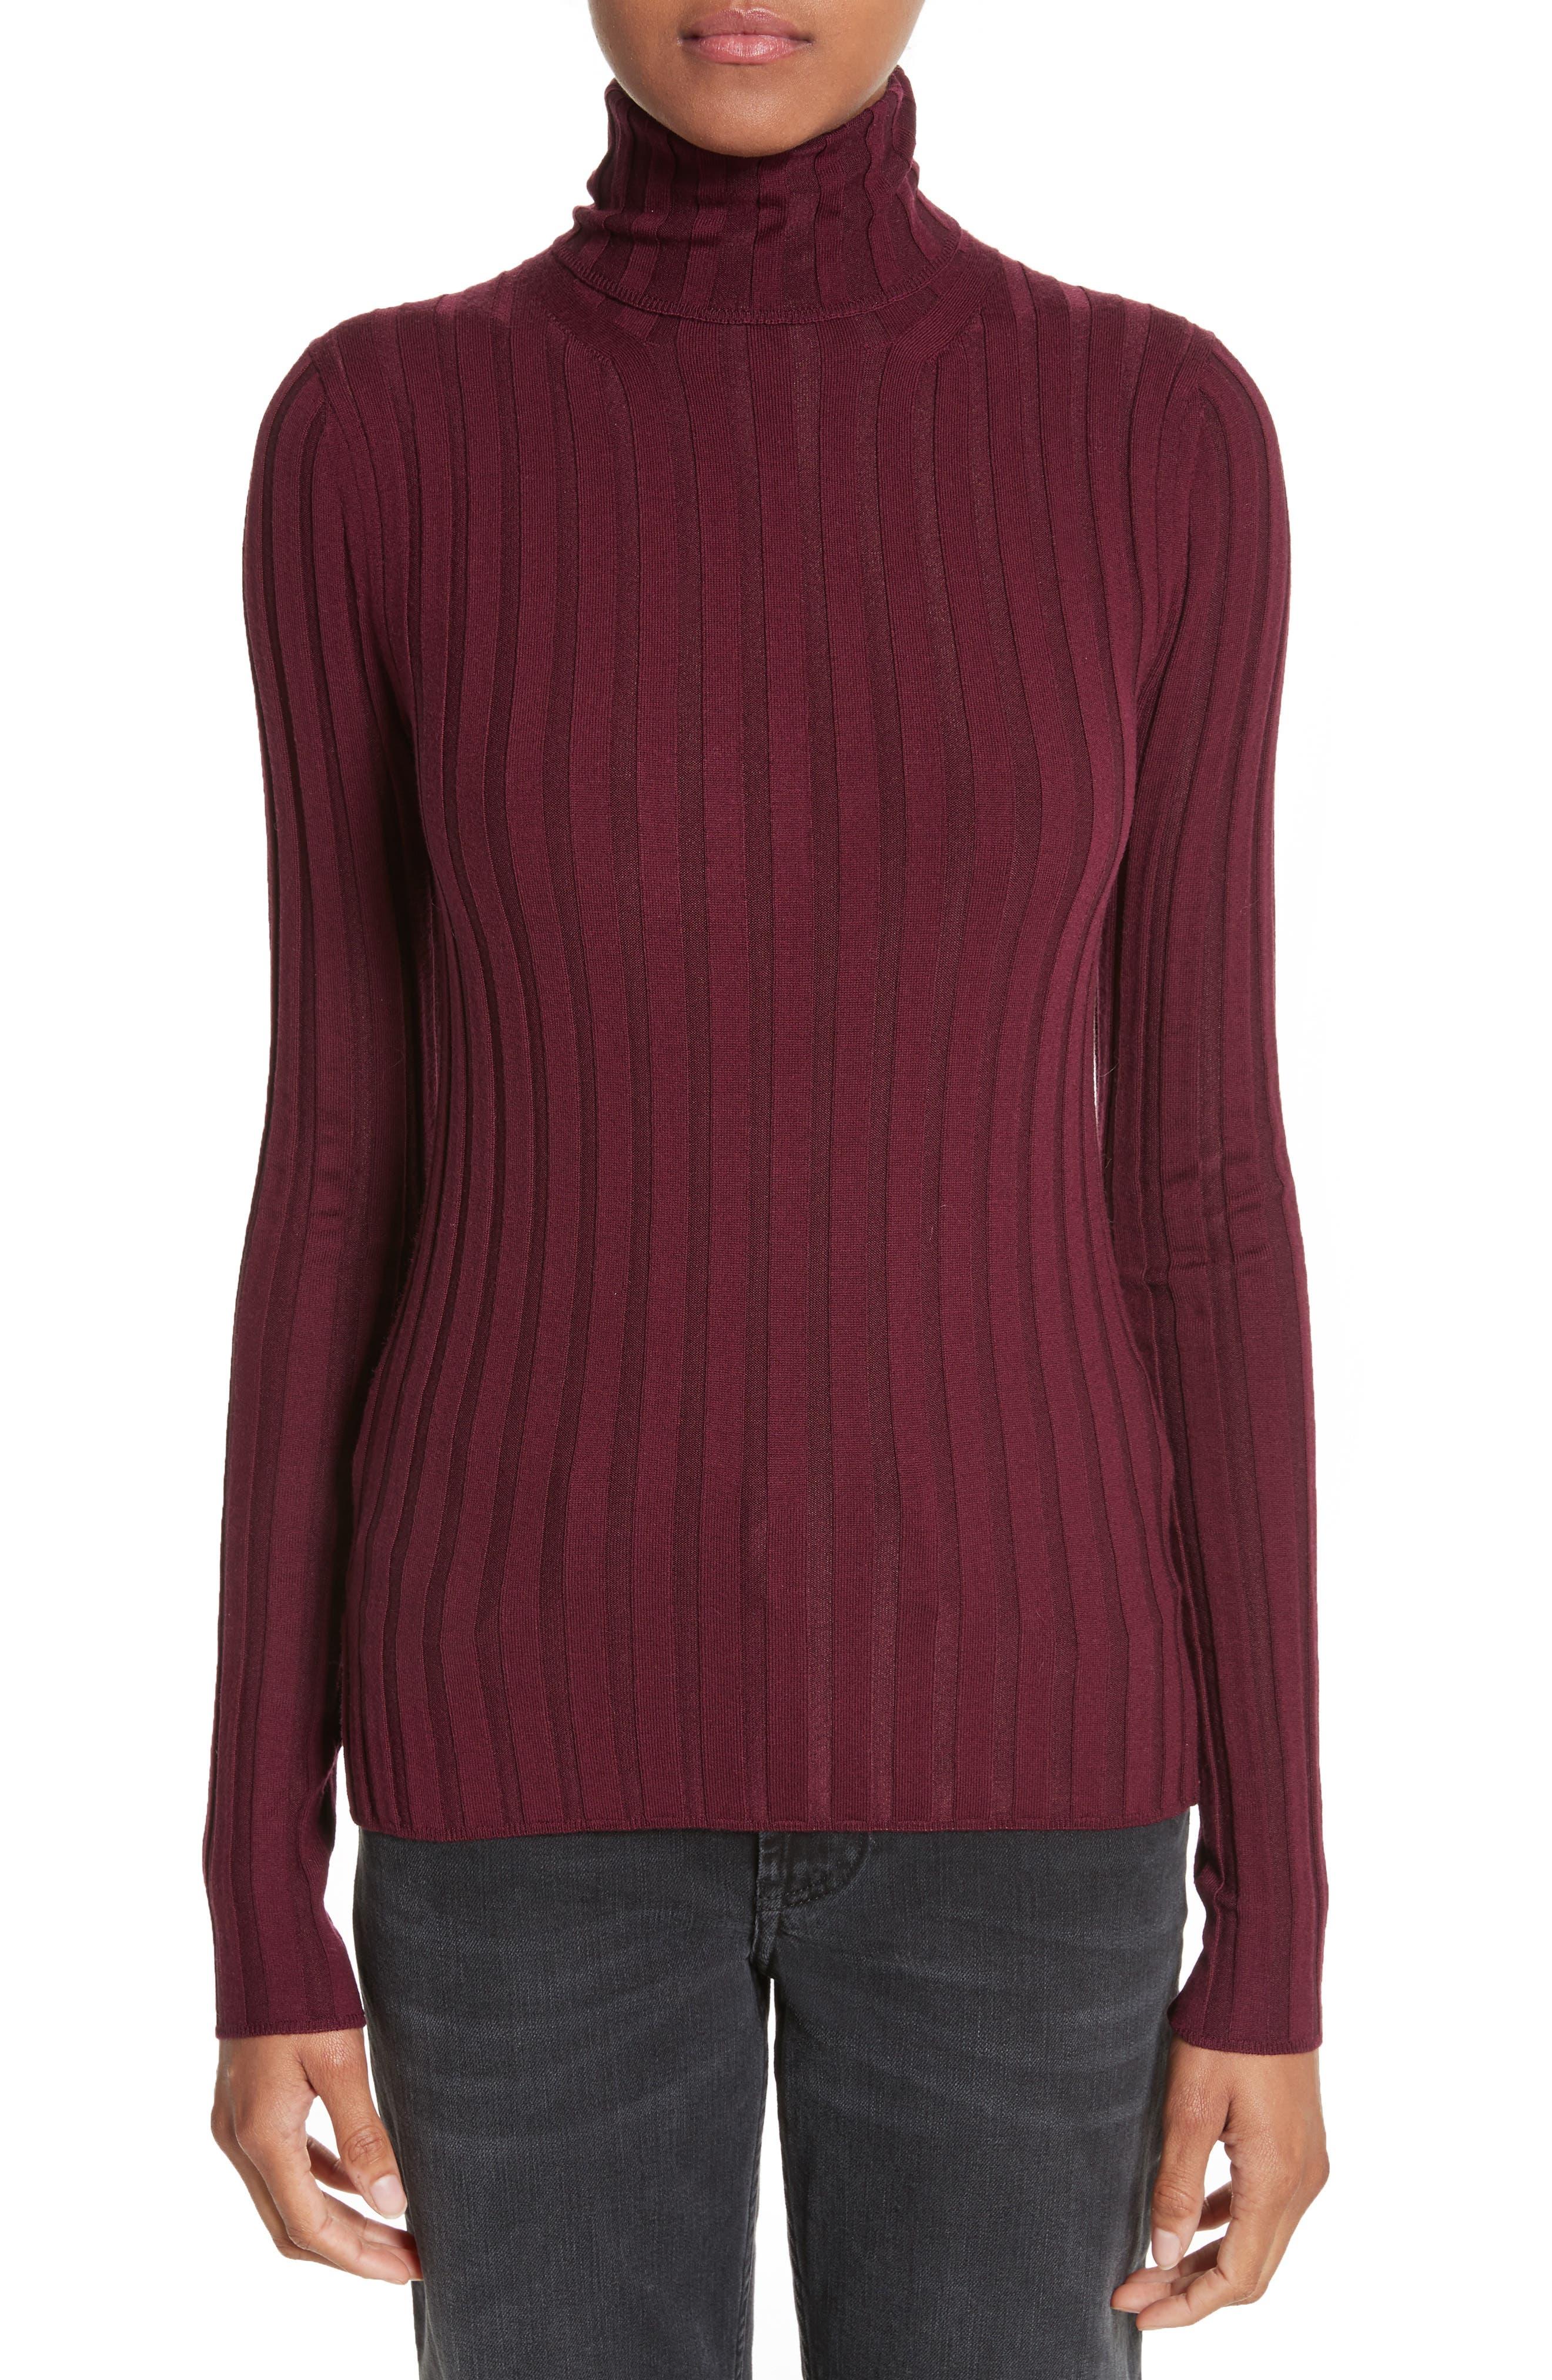 ACNE Studios Corina Fitted Turtleneck Sweater